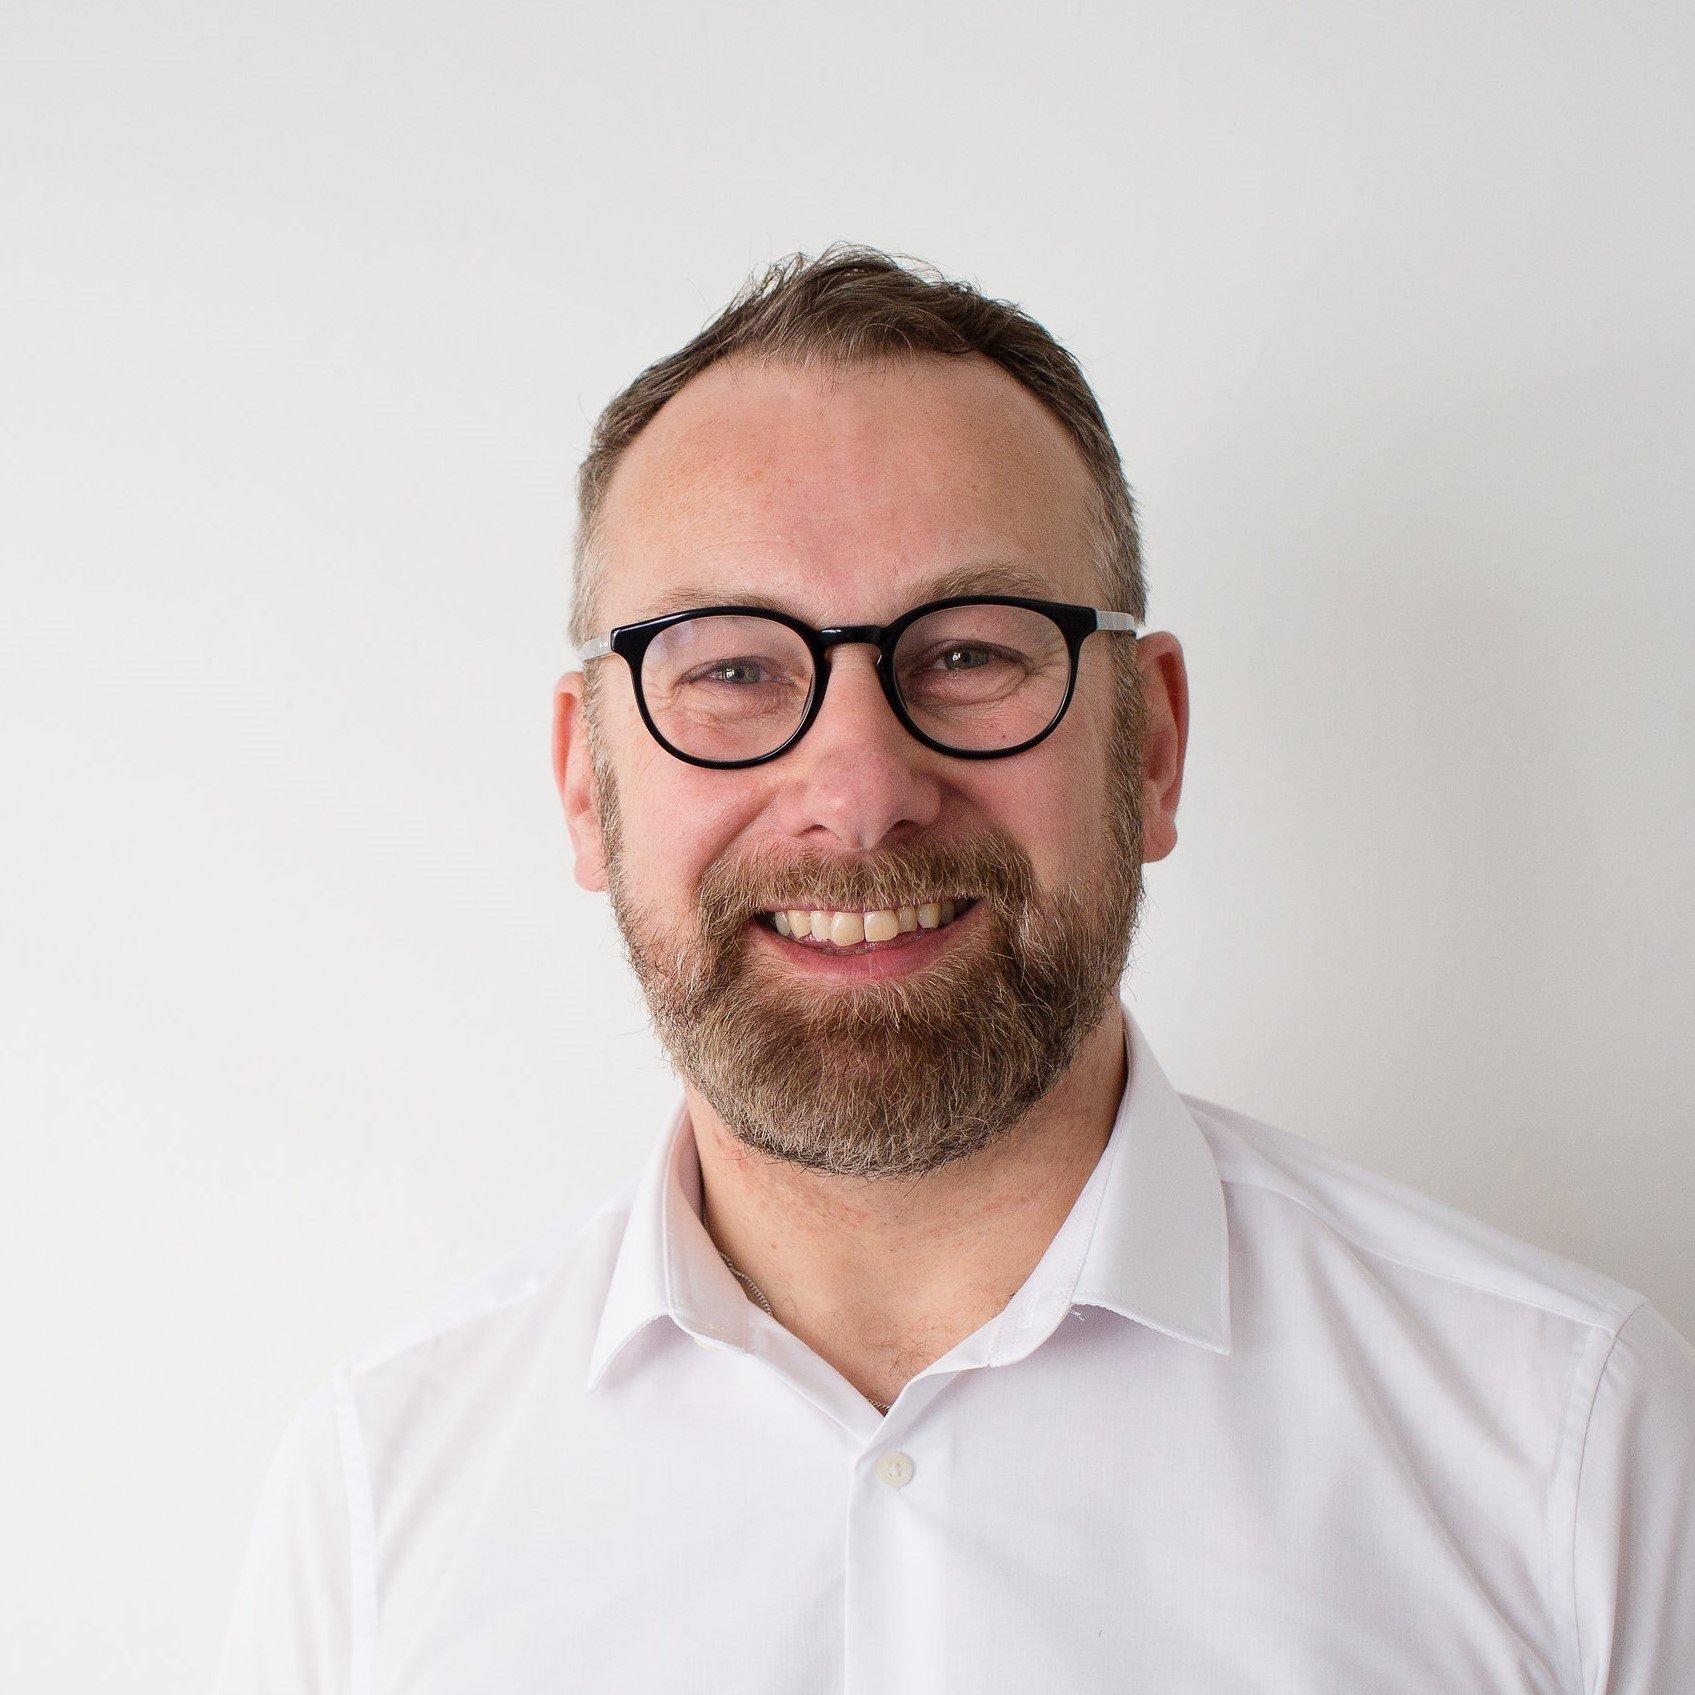 Torbay Acupuncturist Darren Stoyle profile photo